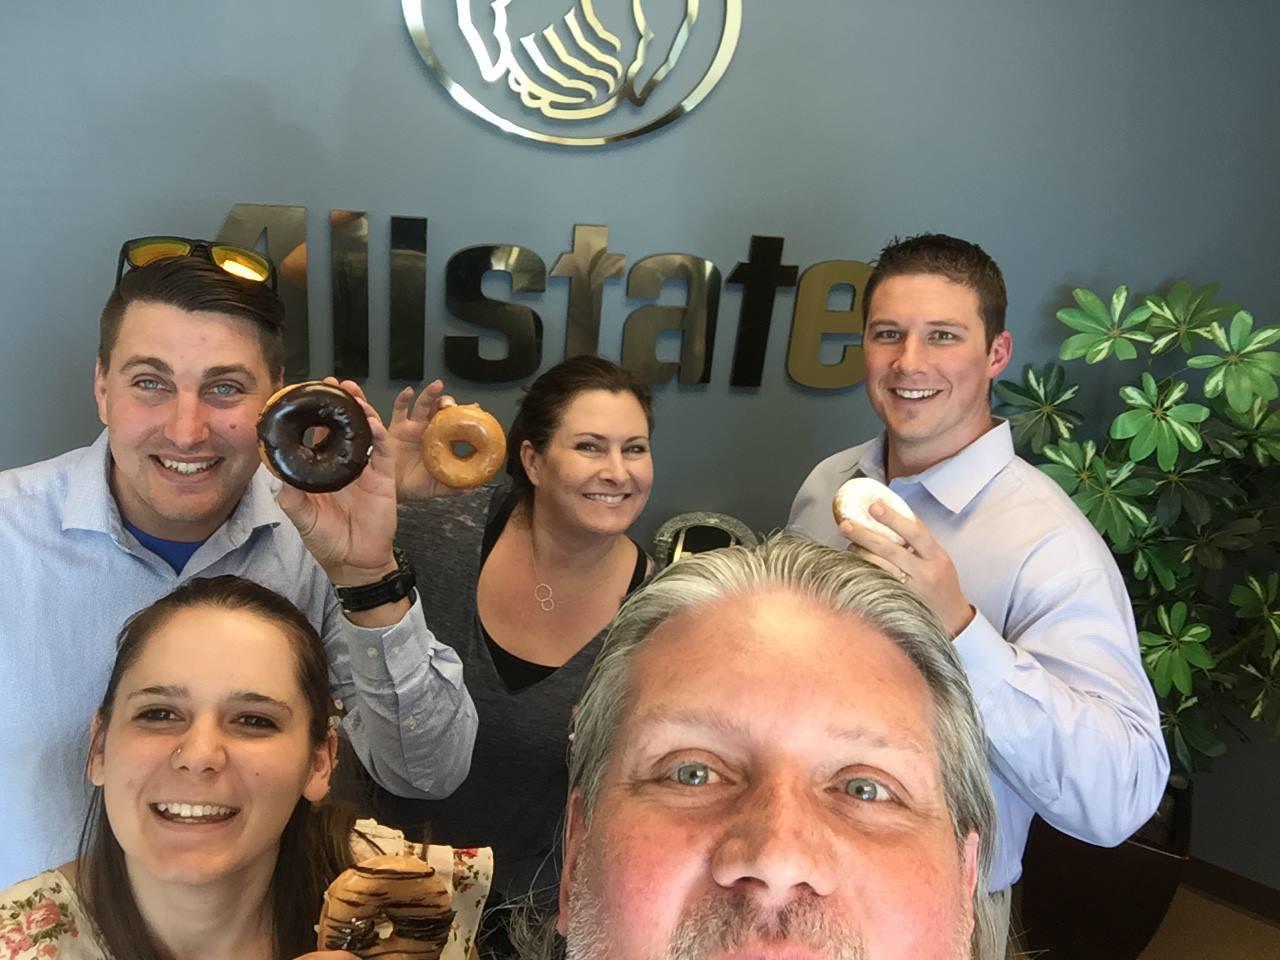 Brian Weatherman: Allstate Insurance image 14